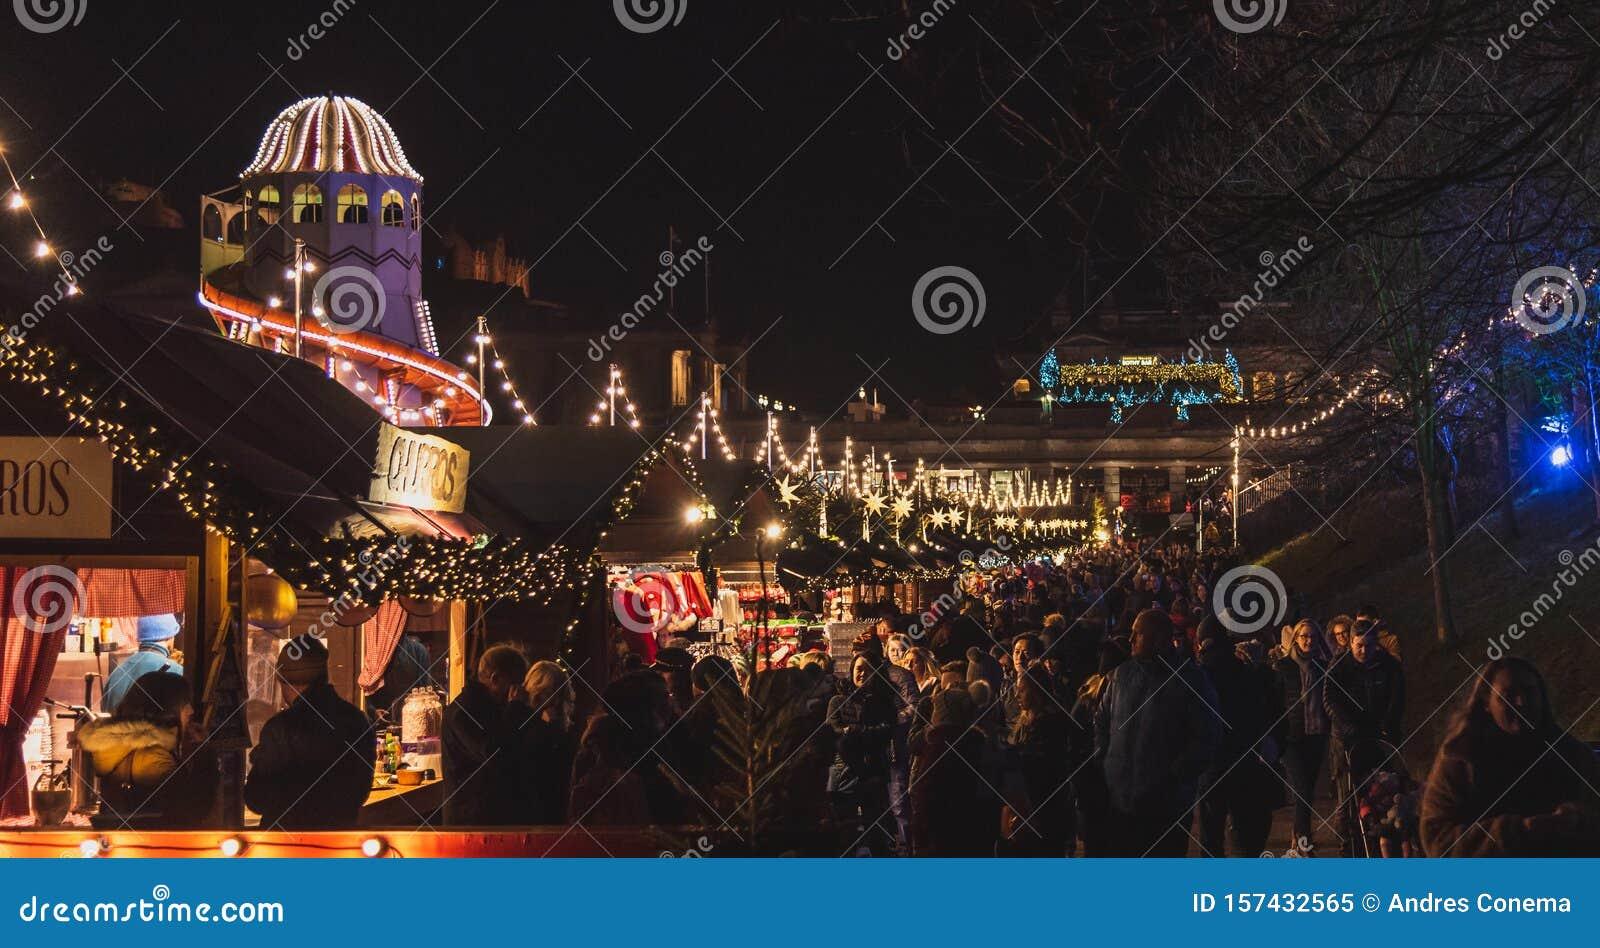 EDINBURGH, SCOTLAND DECEMBER 13, 2018: Panoramic View Of Illuminated Christmas Fair With Loads ...